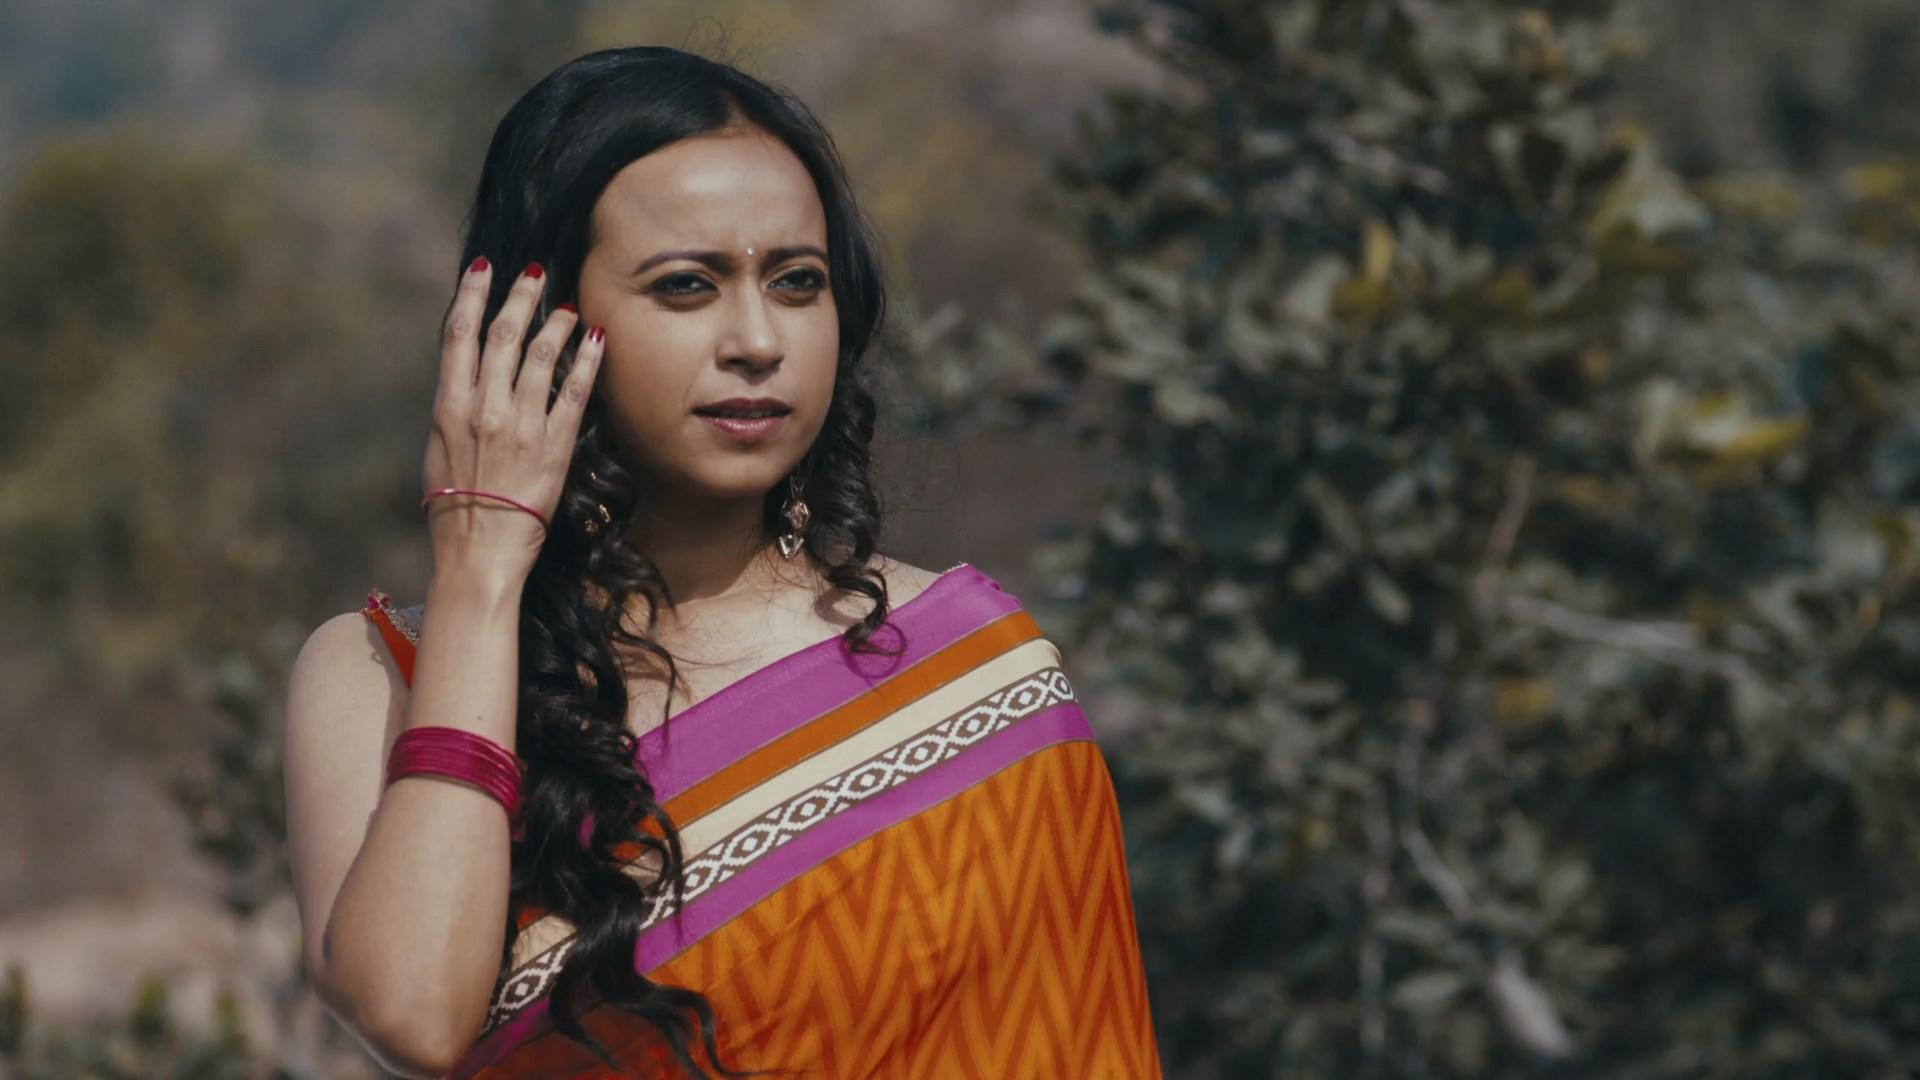 Raktanchal S01 35 - 18+ Raktanchal S01 2020 Hindi MX Original Complete Web Series 480p HDRip 700MB x264 AAC